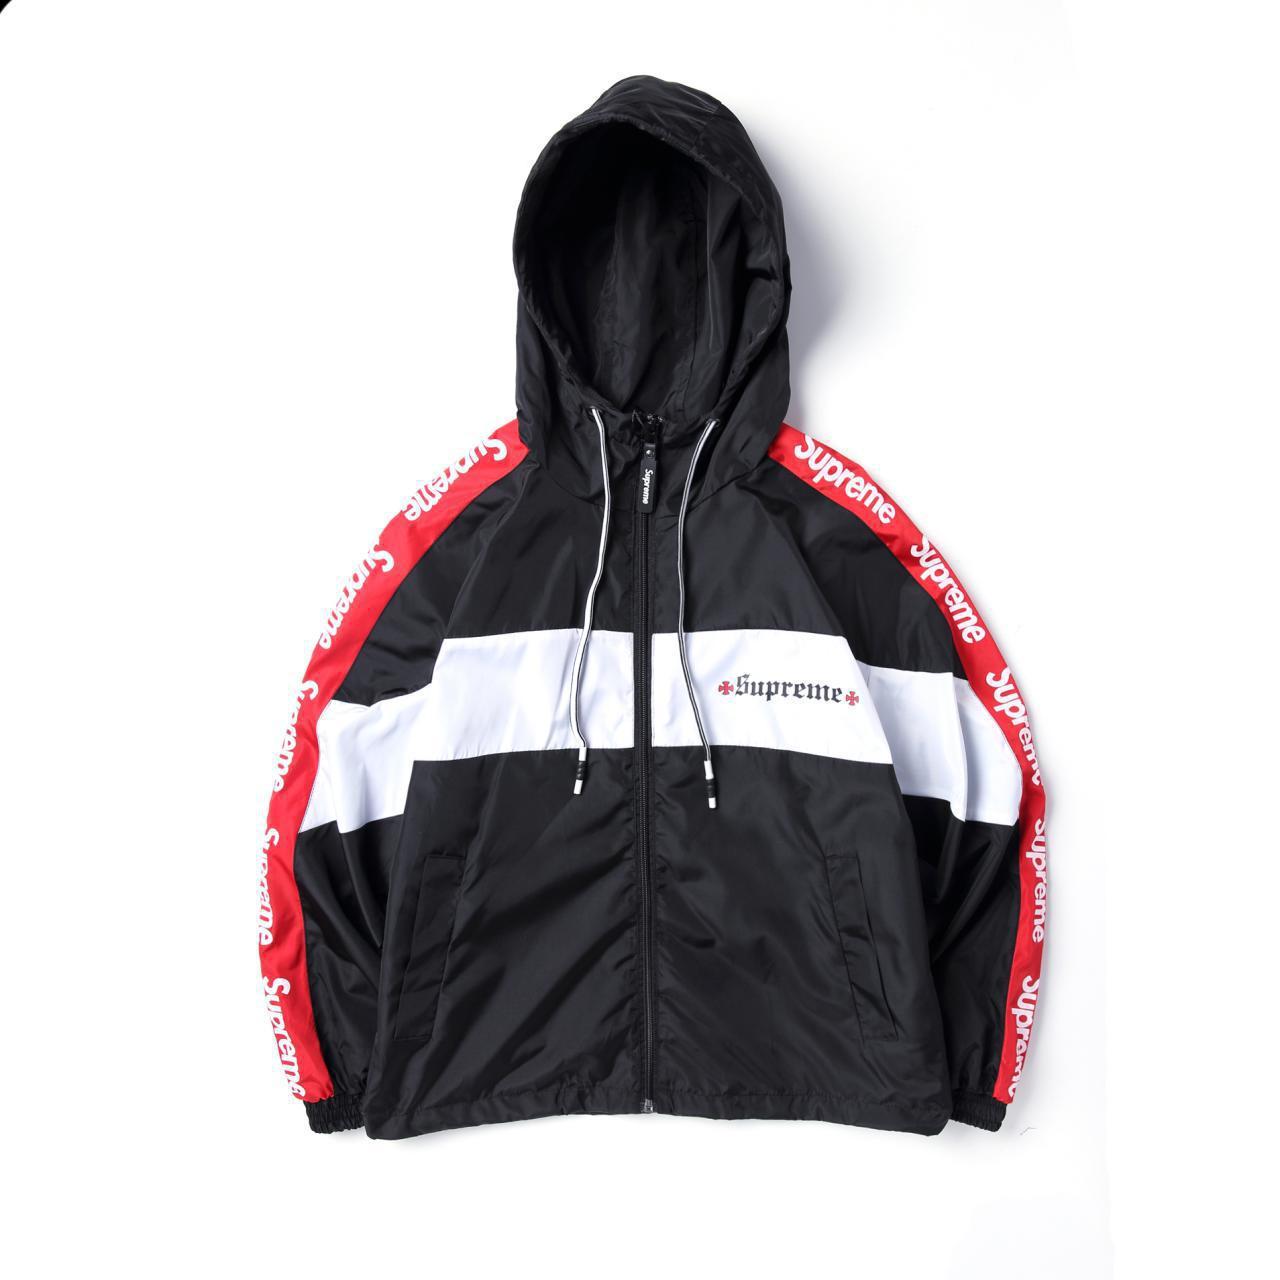 Ветровка Supreme Black White red унисекс - Компания